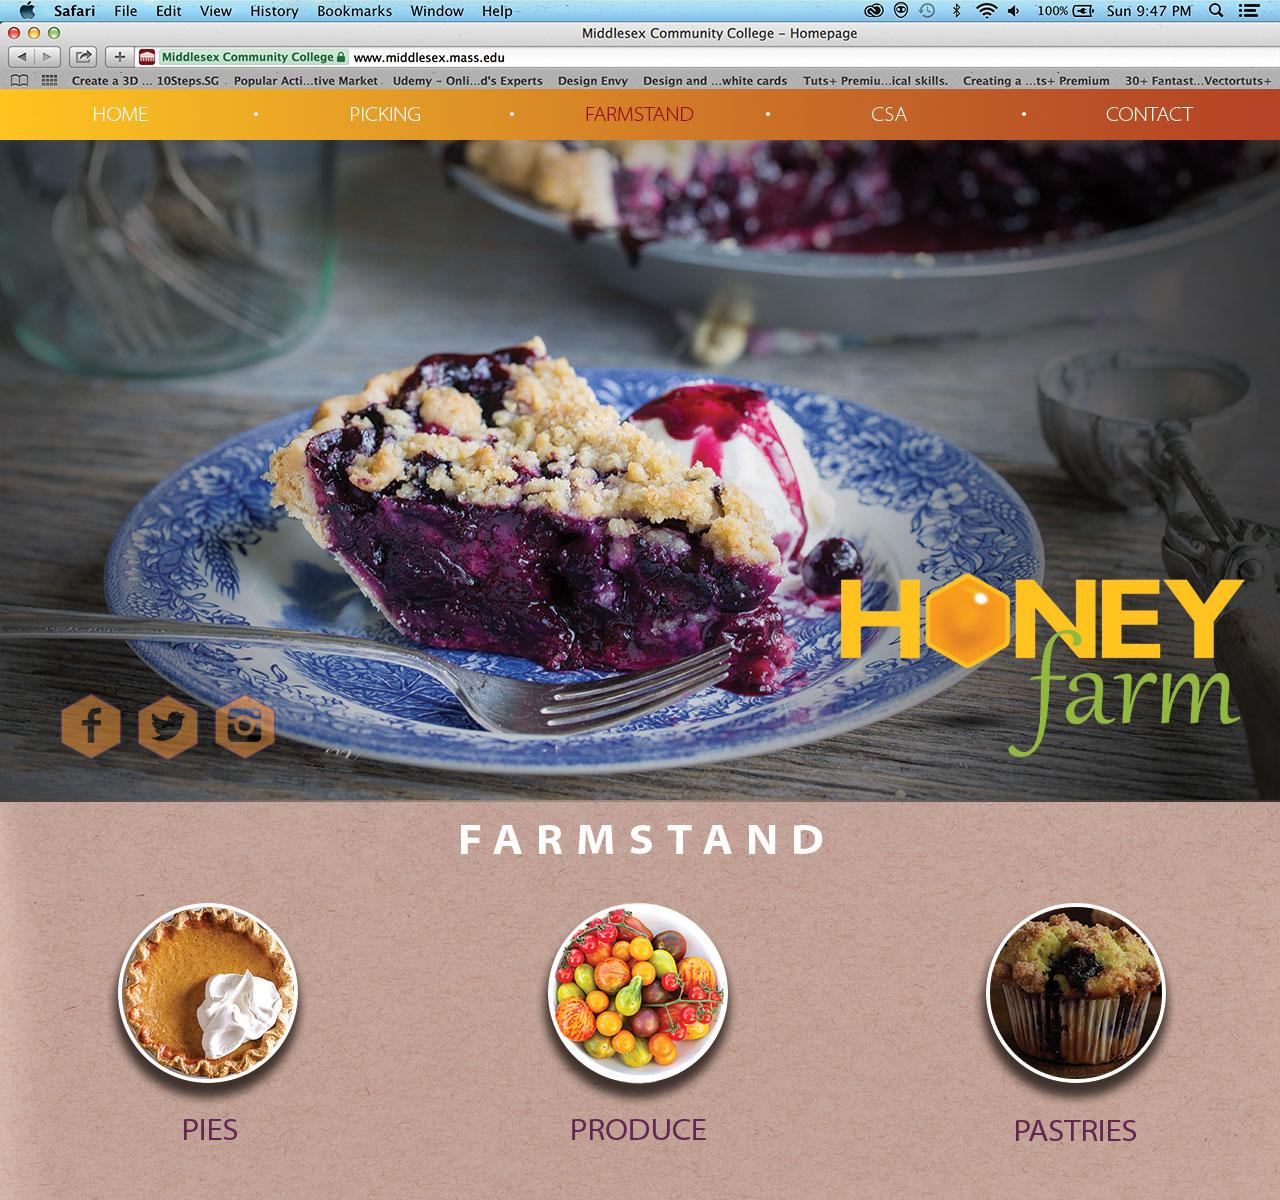 Honey Farm Farmstand page